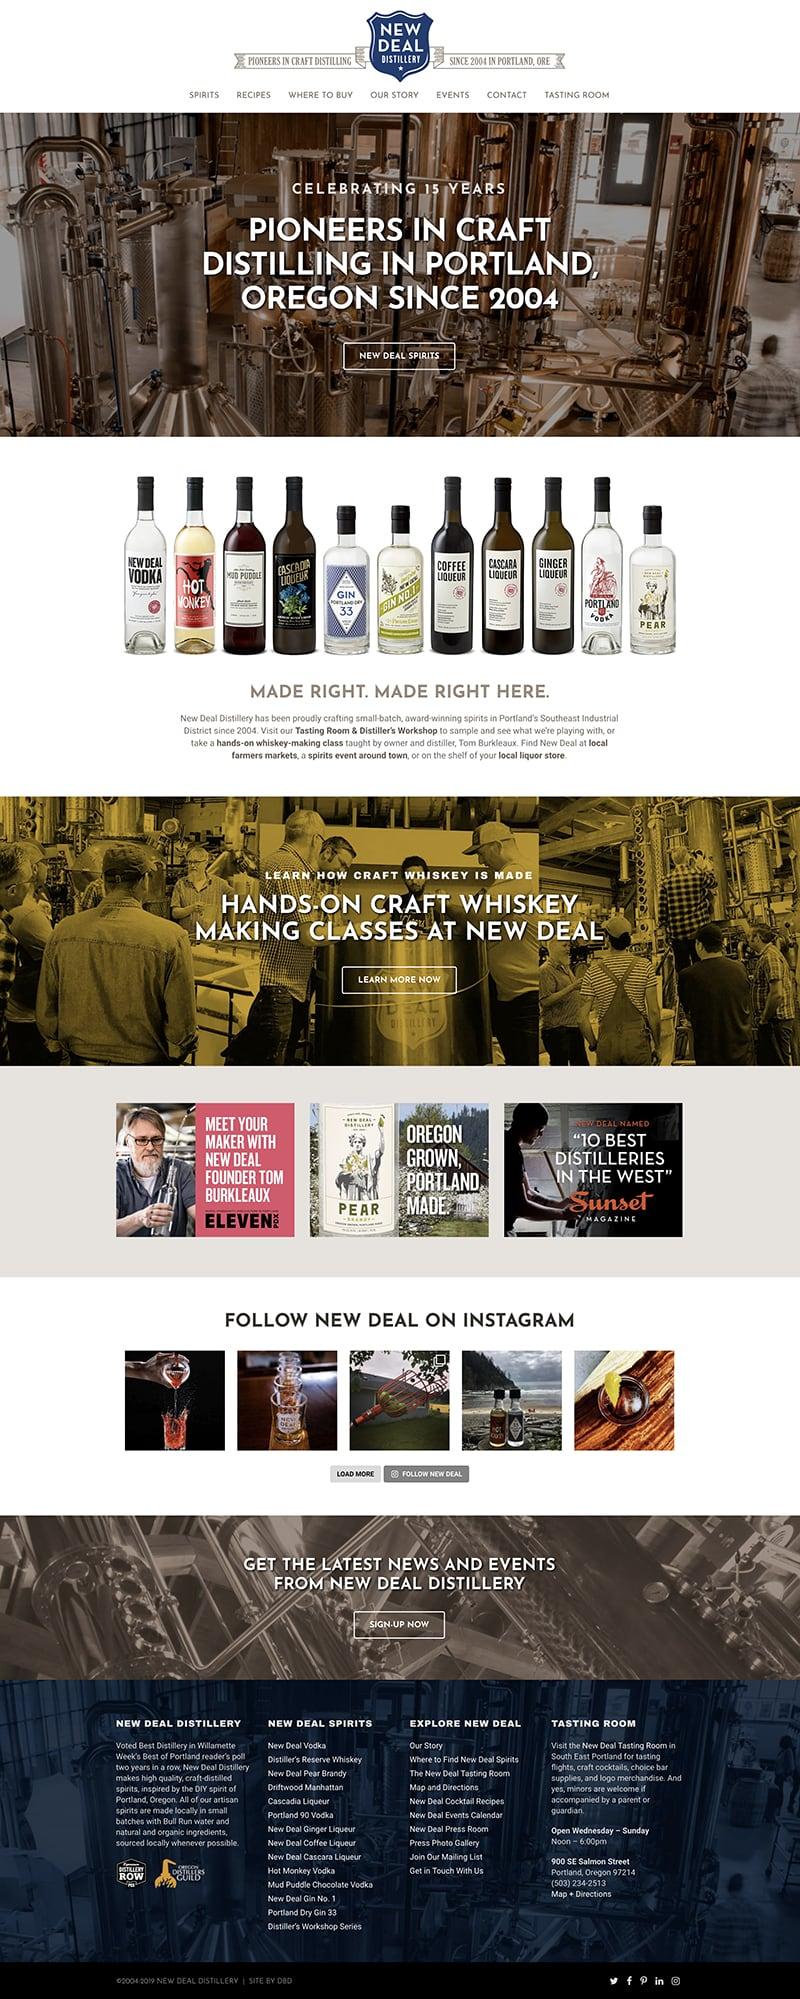 New Deal Distillery Website